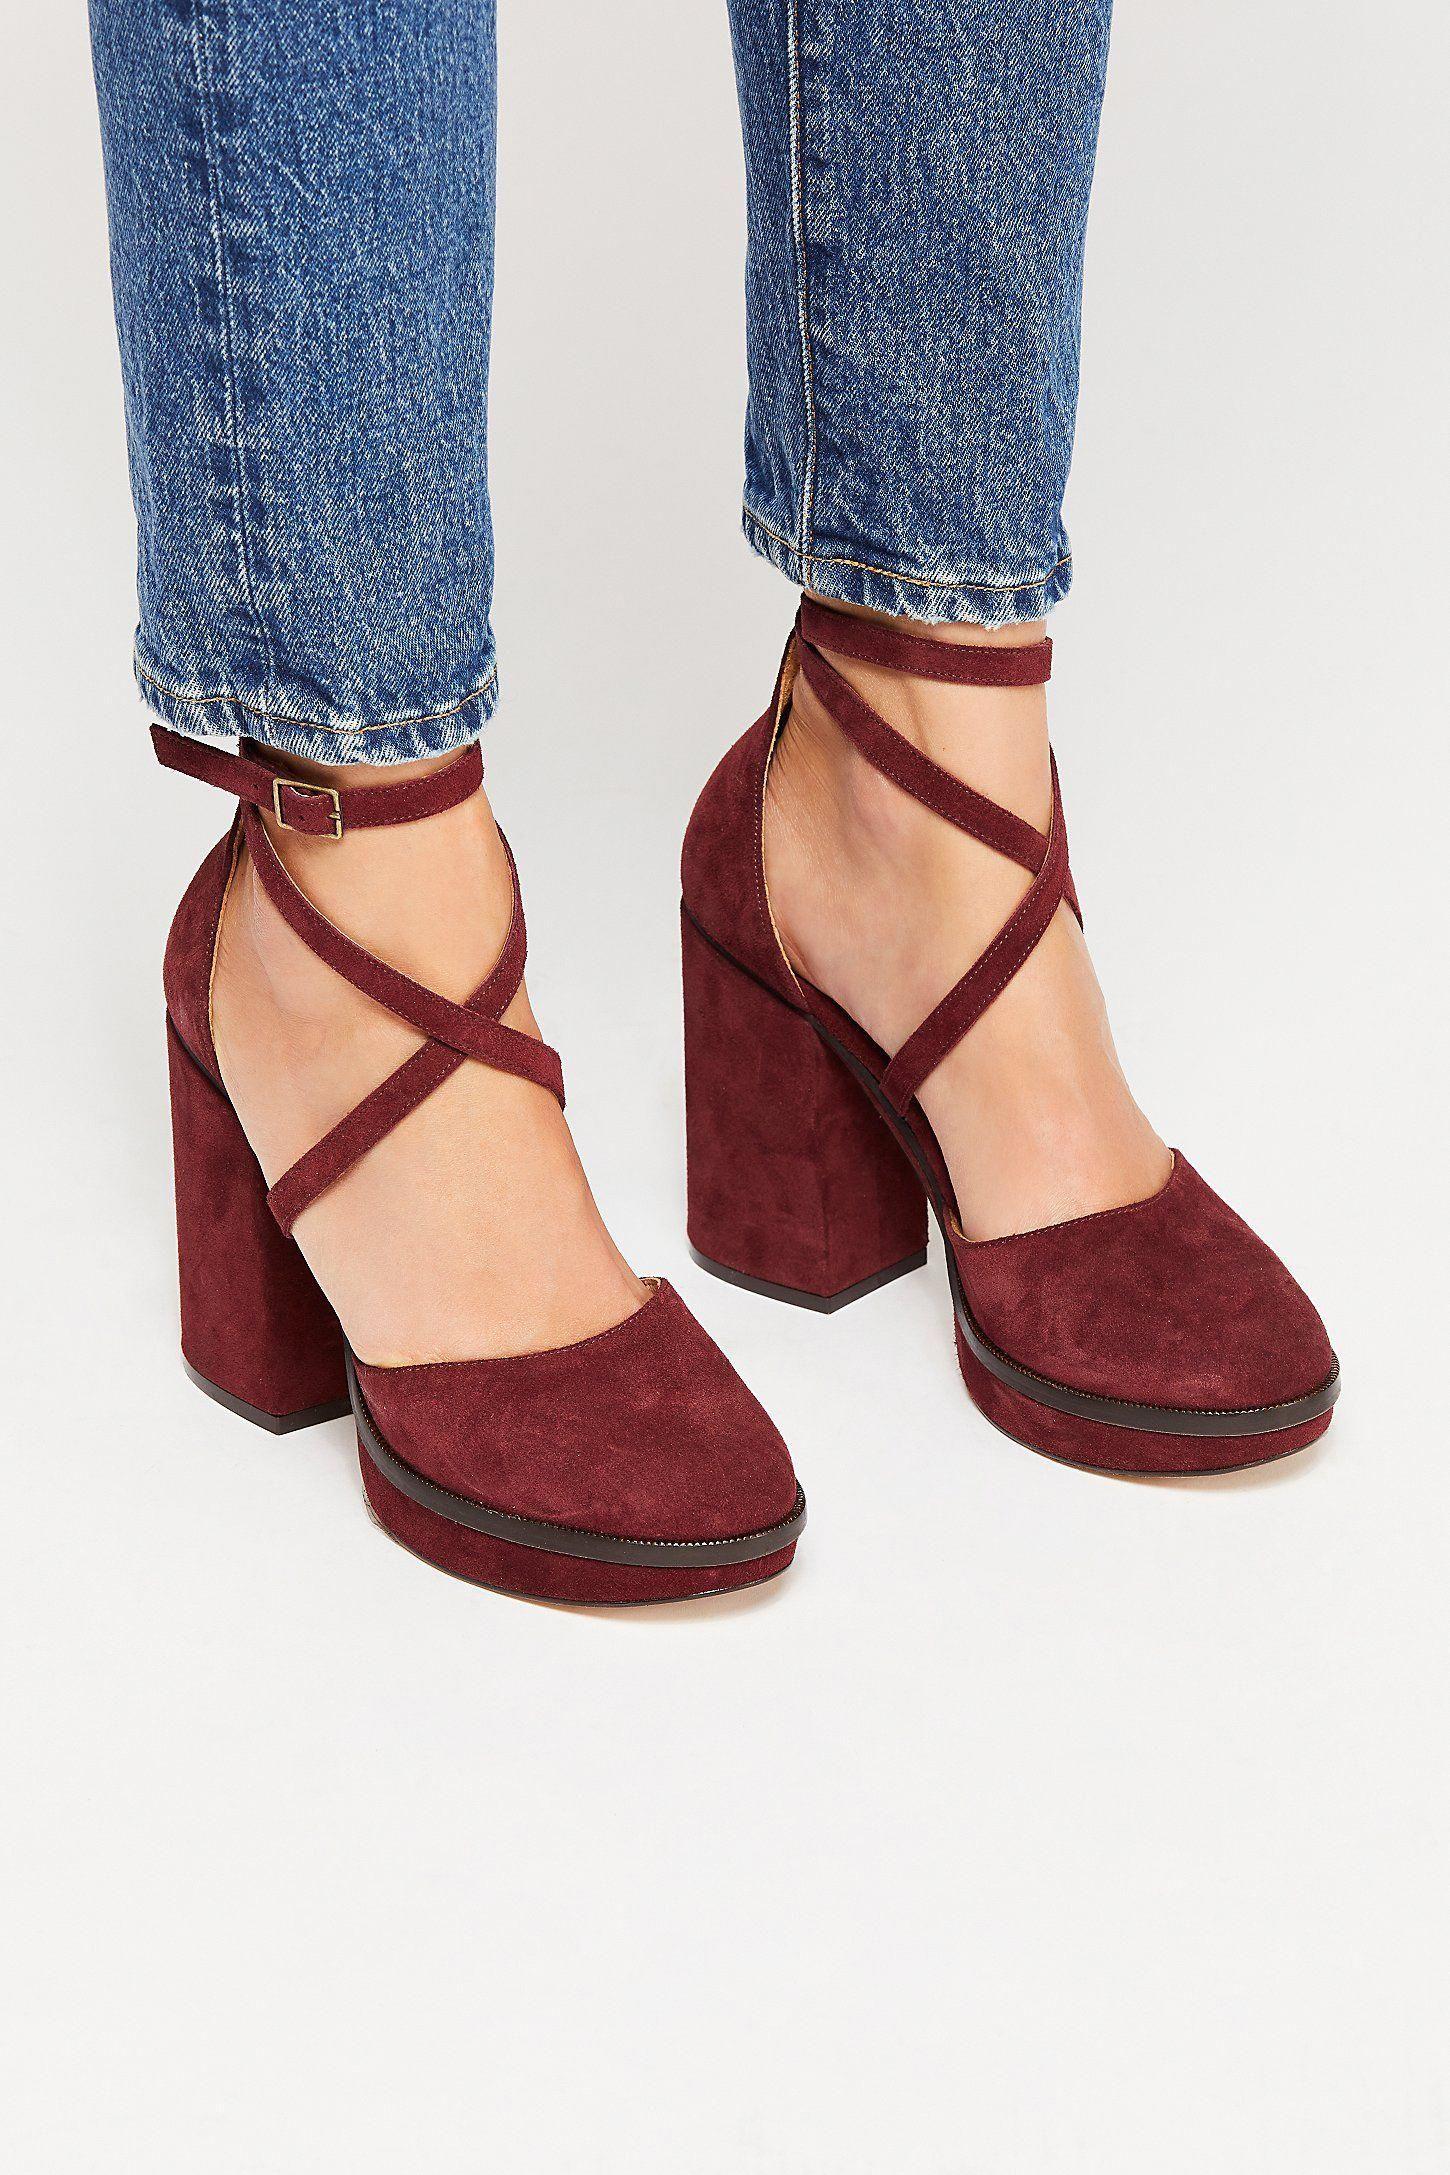 Heels, Women shoes, Womens sandals